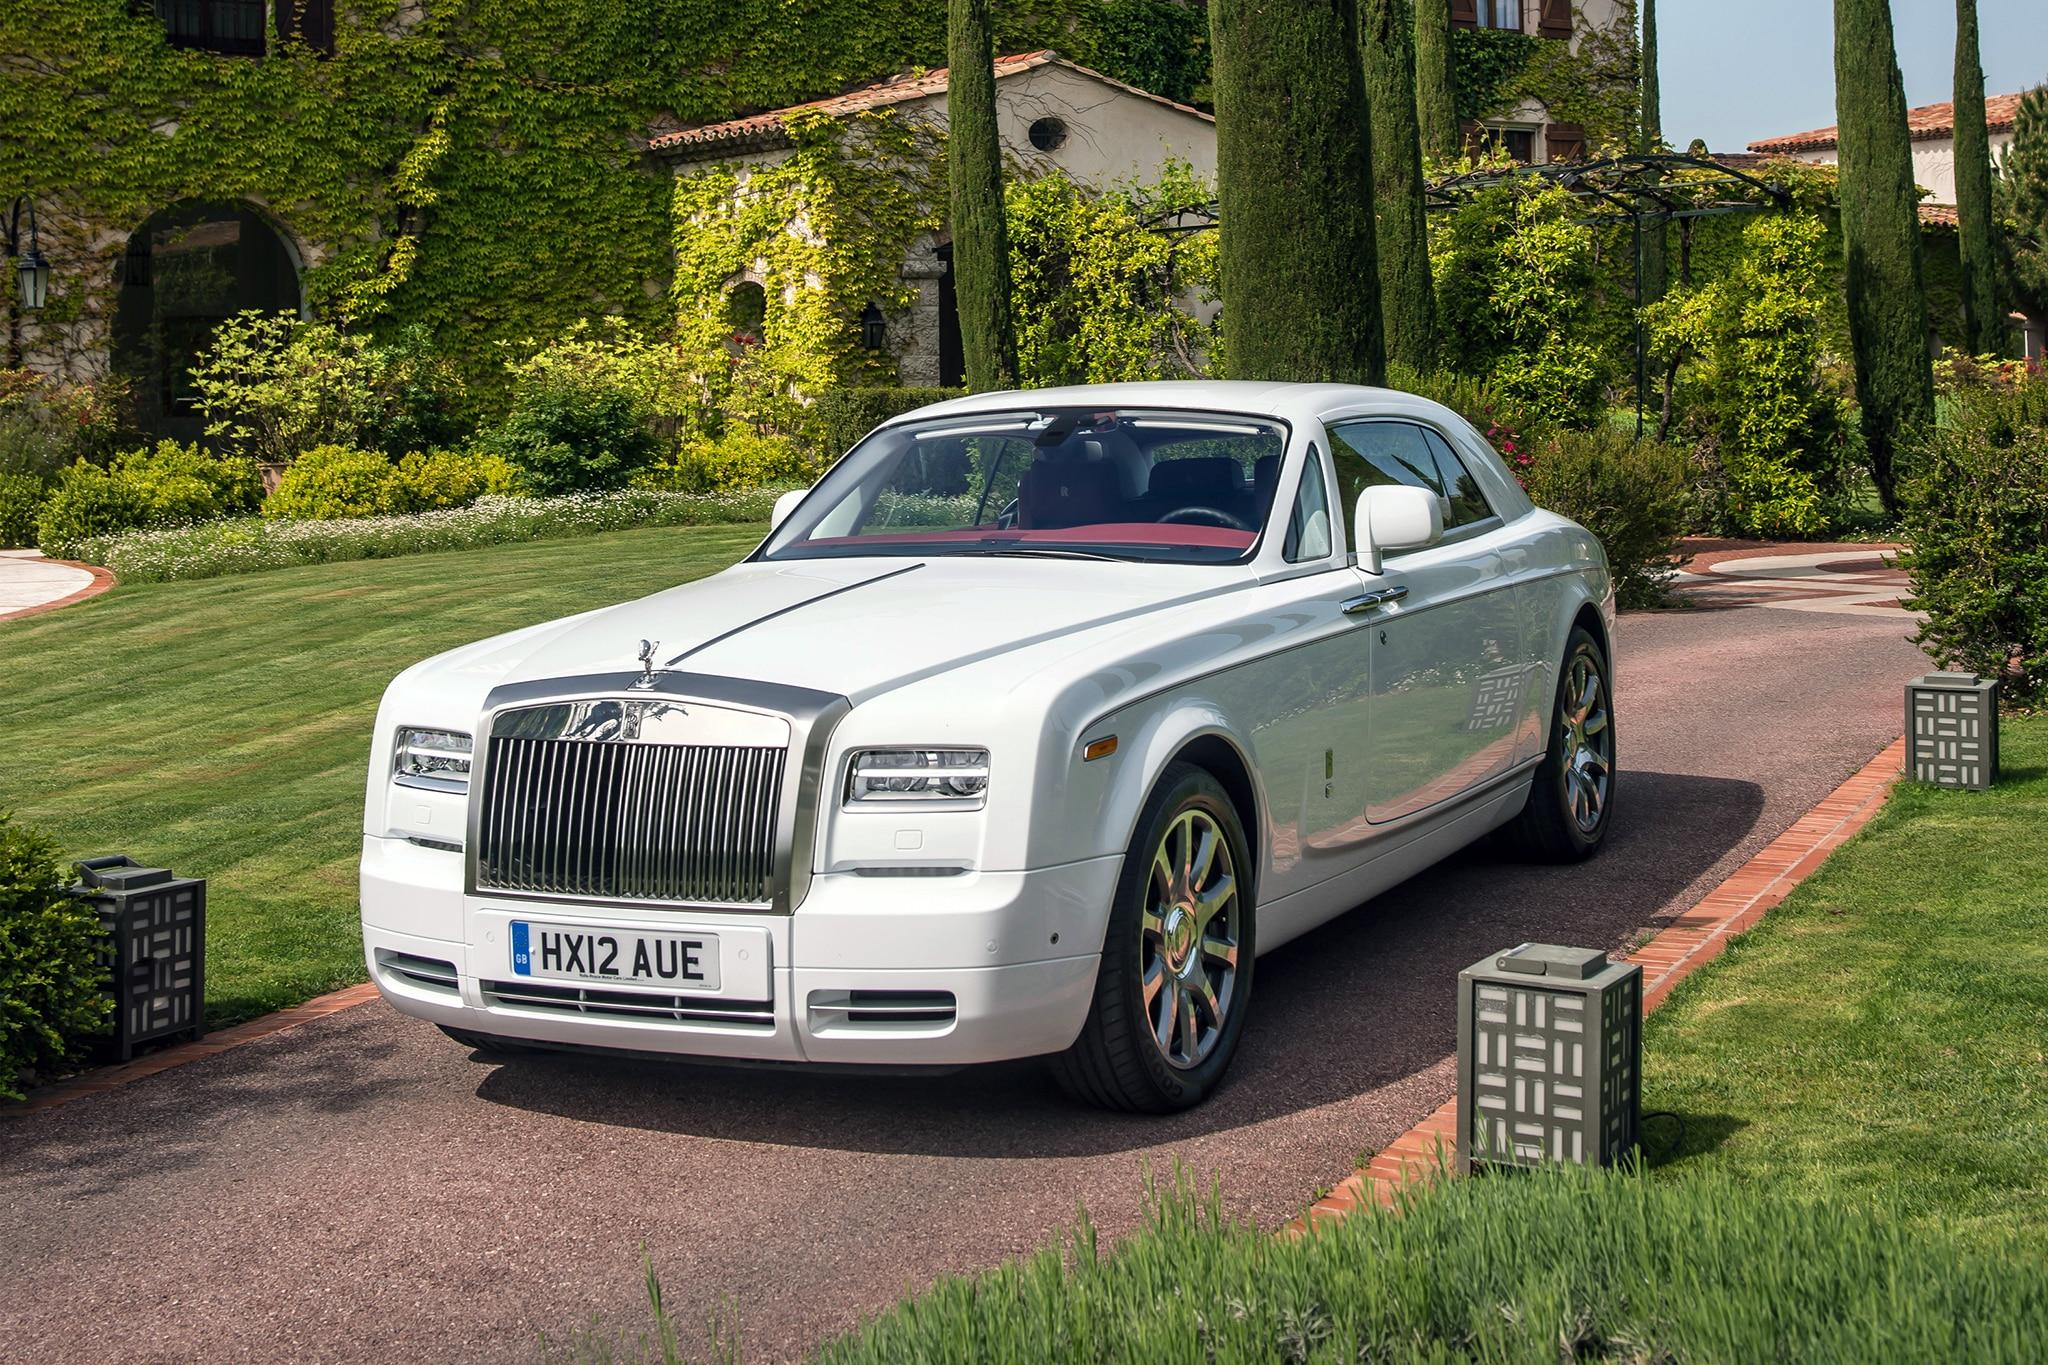 Next Rolls-Royce Phantom To Slim Down Thanks To Aluminum